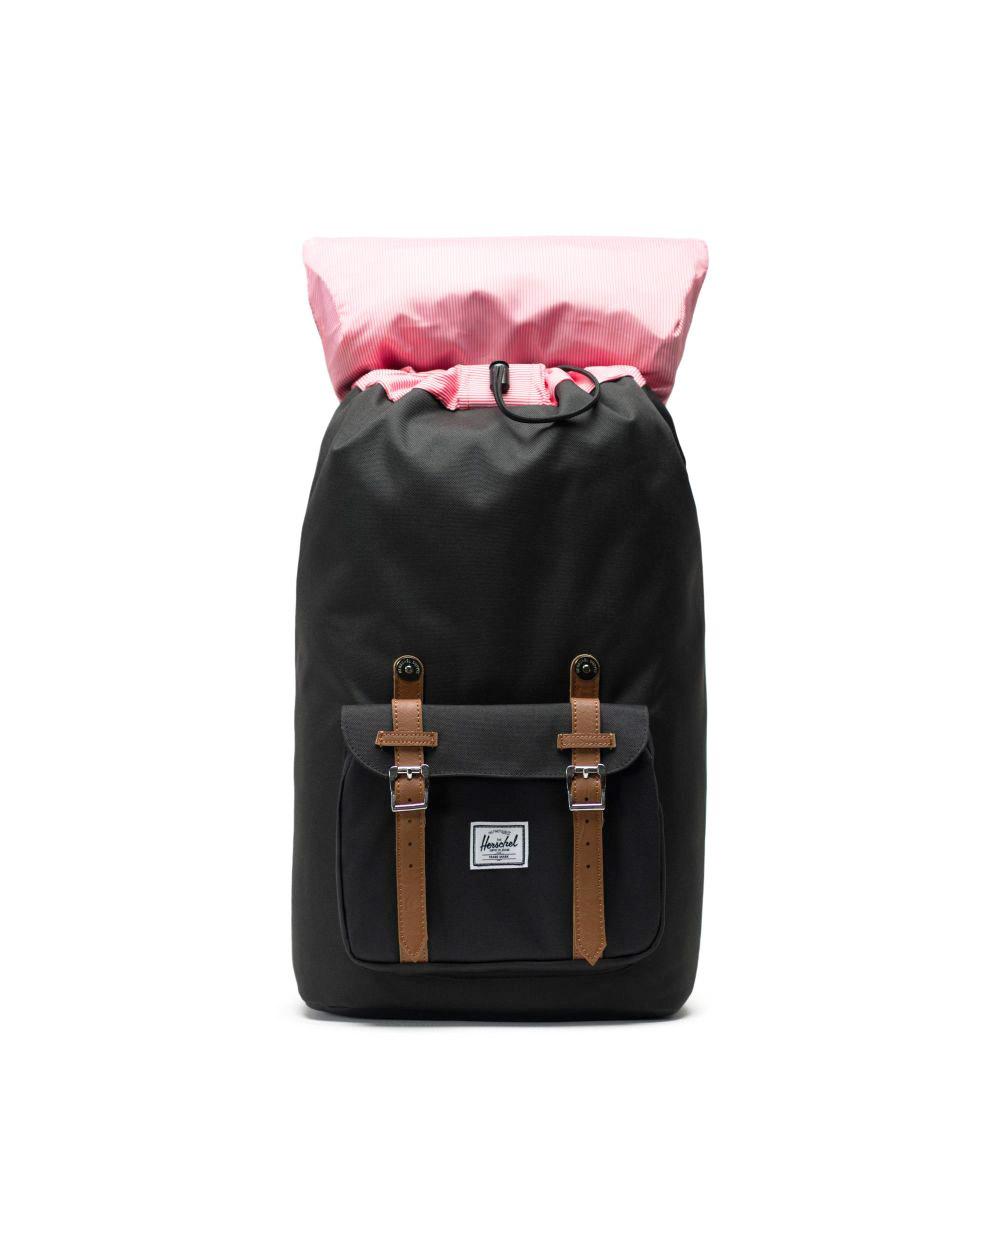 Herschel Little America Backpack Black Inside